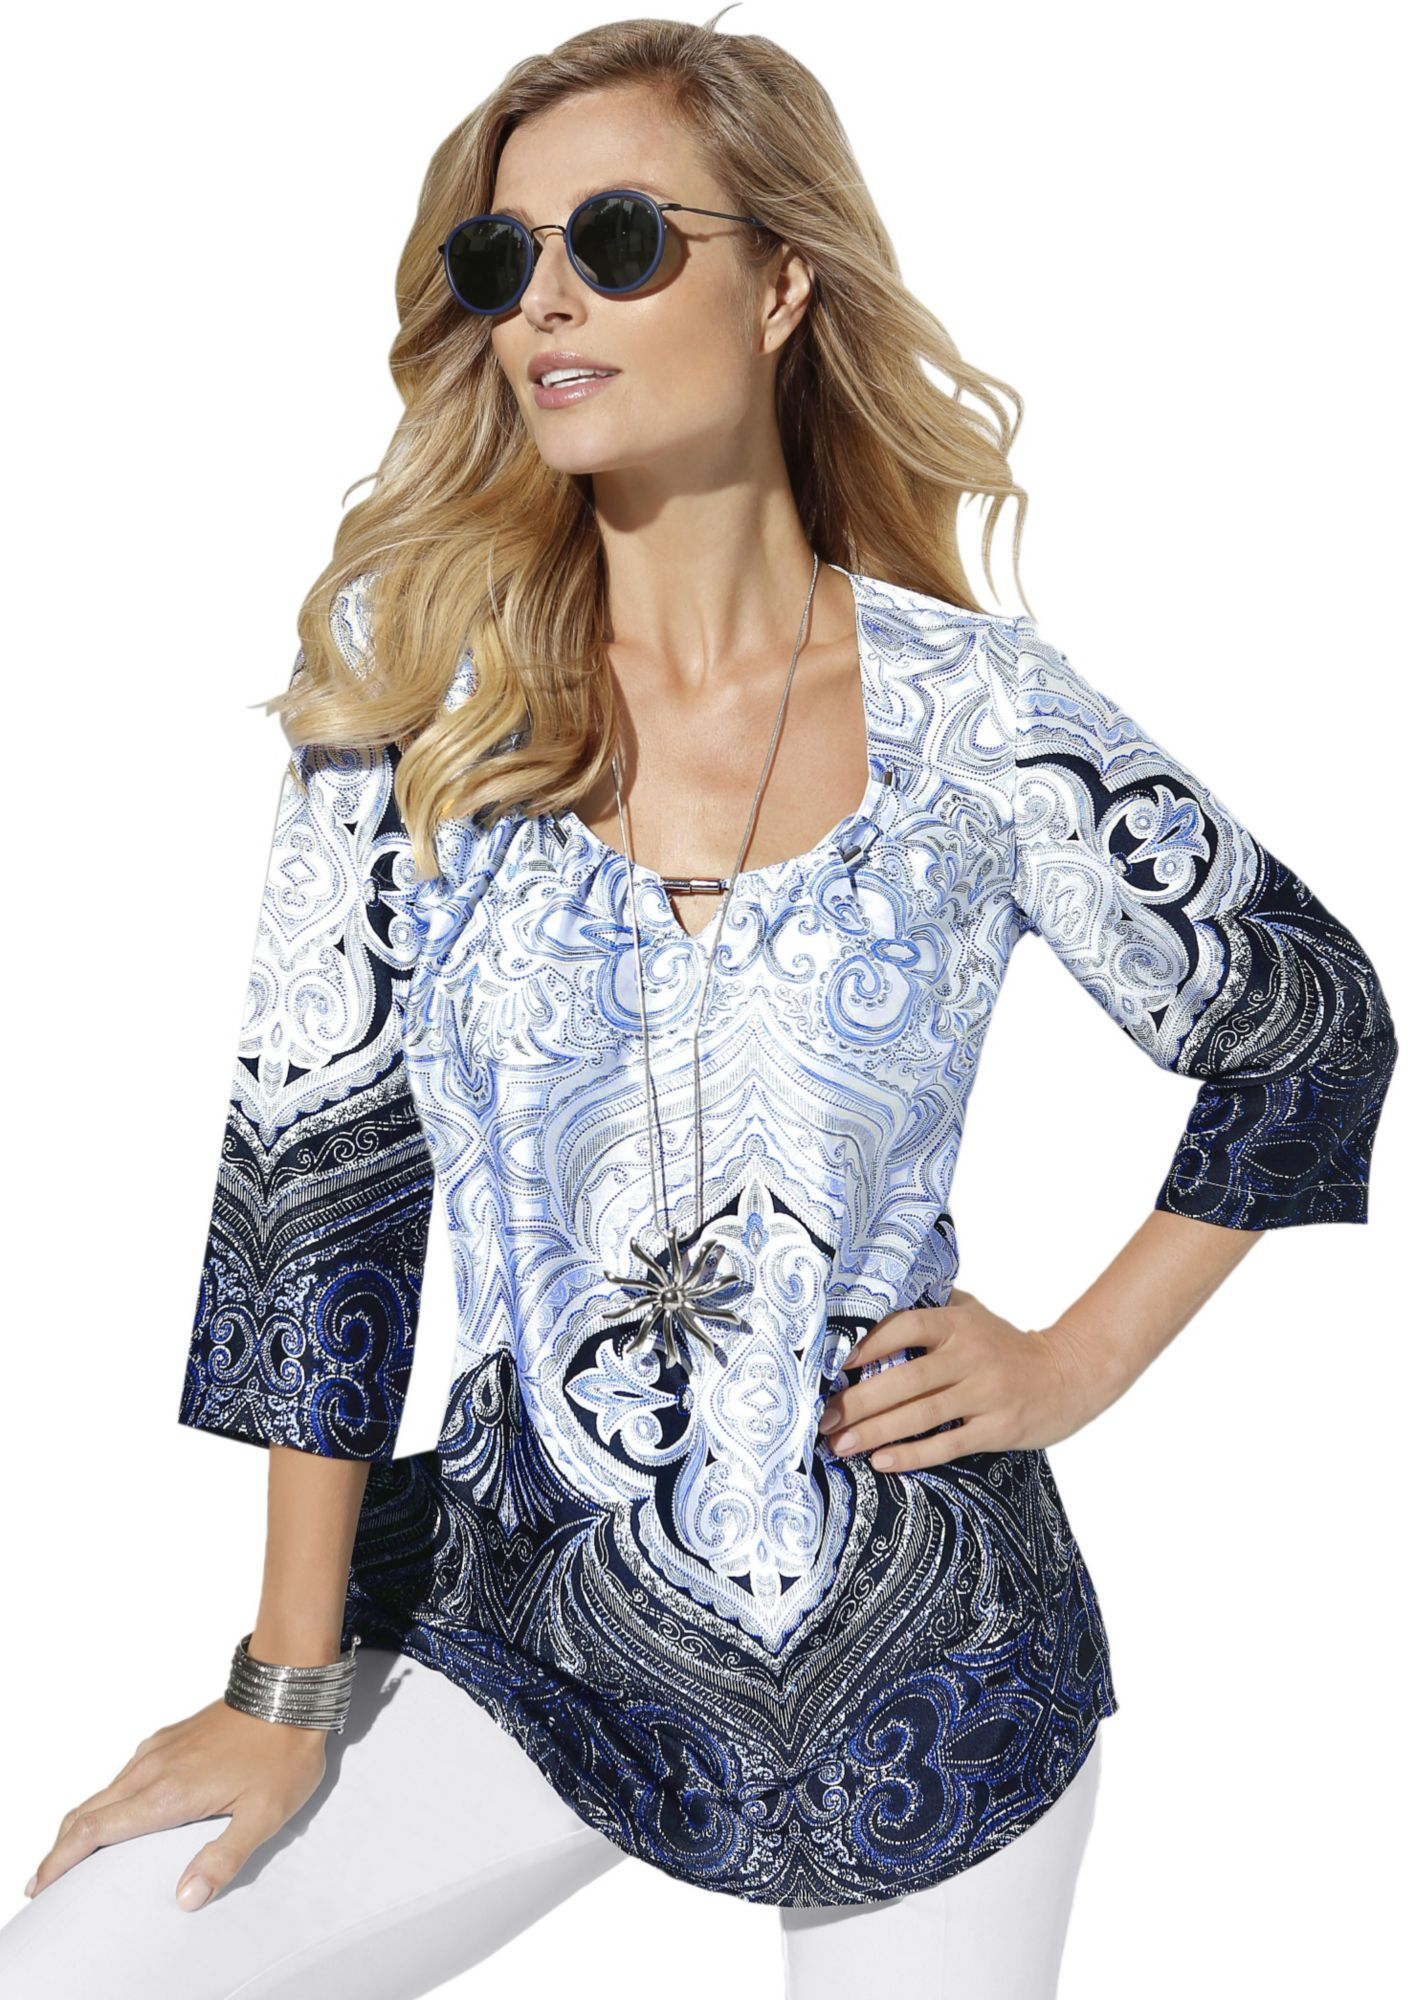 FAIR LADY Fair Lady Bluse in glänzender Satin-Optik